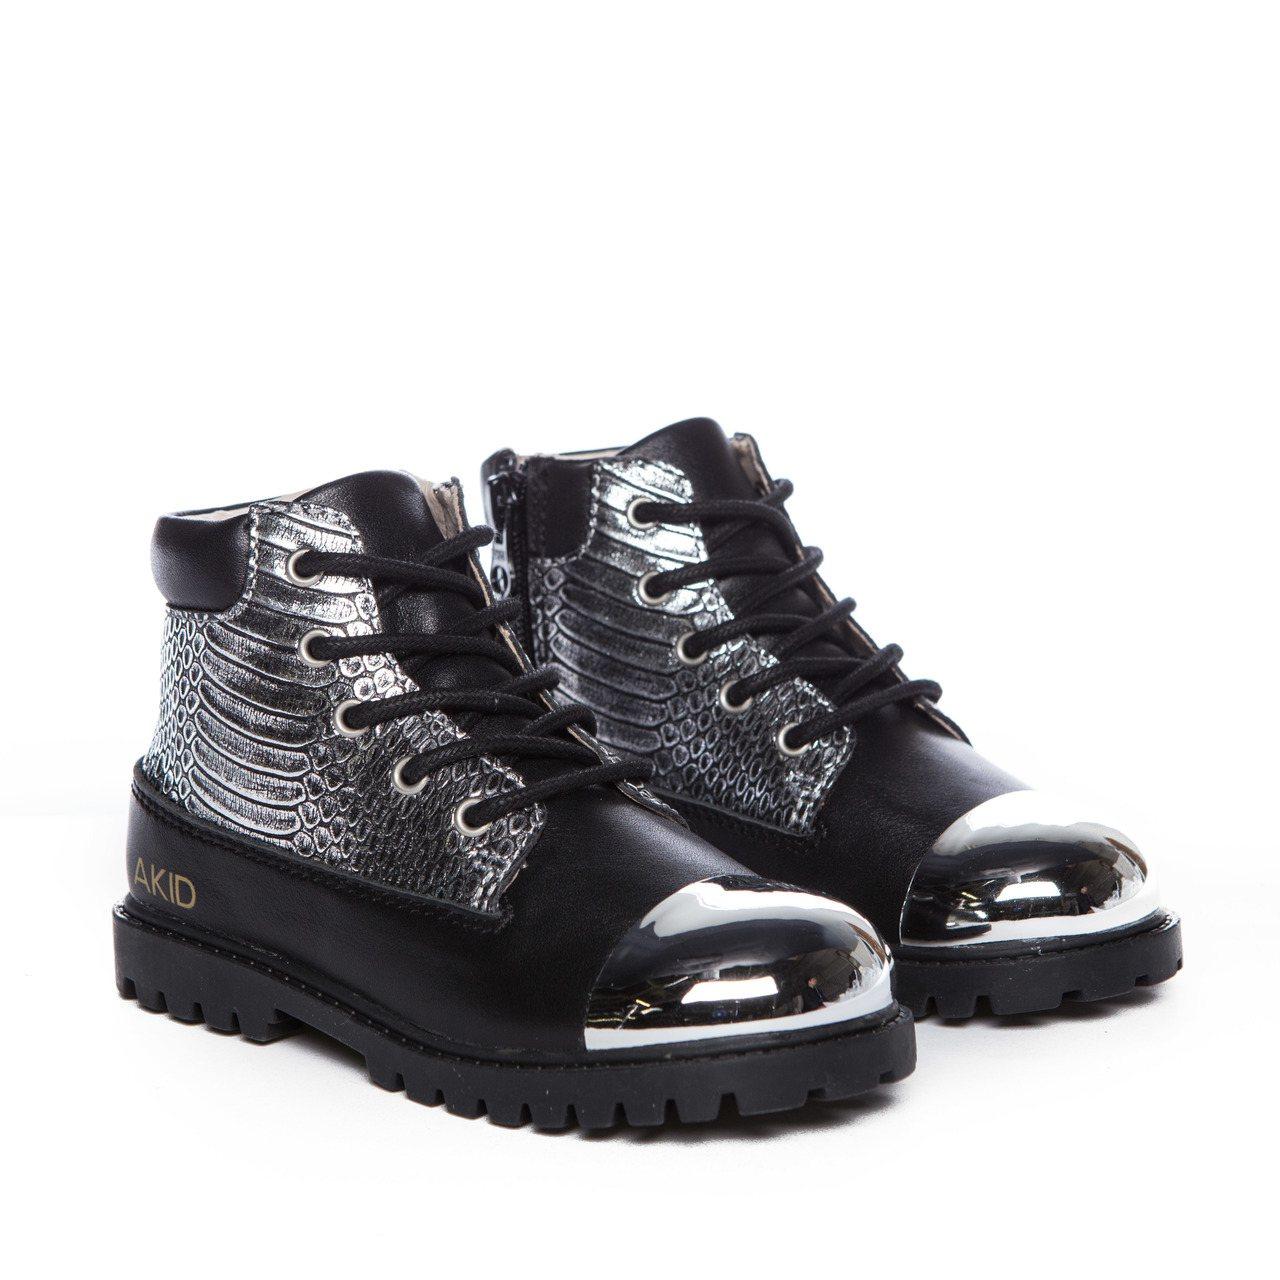 AKID Atticus黑銀拼接蛇紋金屬裝飾高筒童靴,3,320元。圖/AKID...